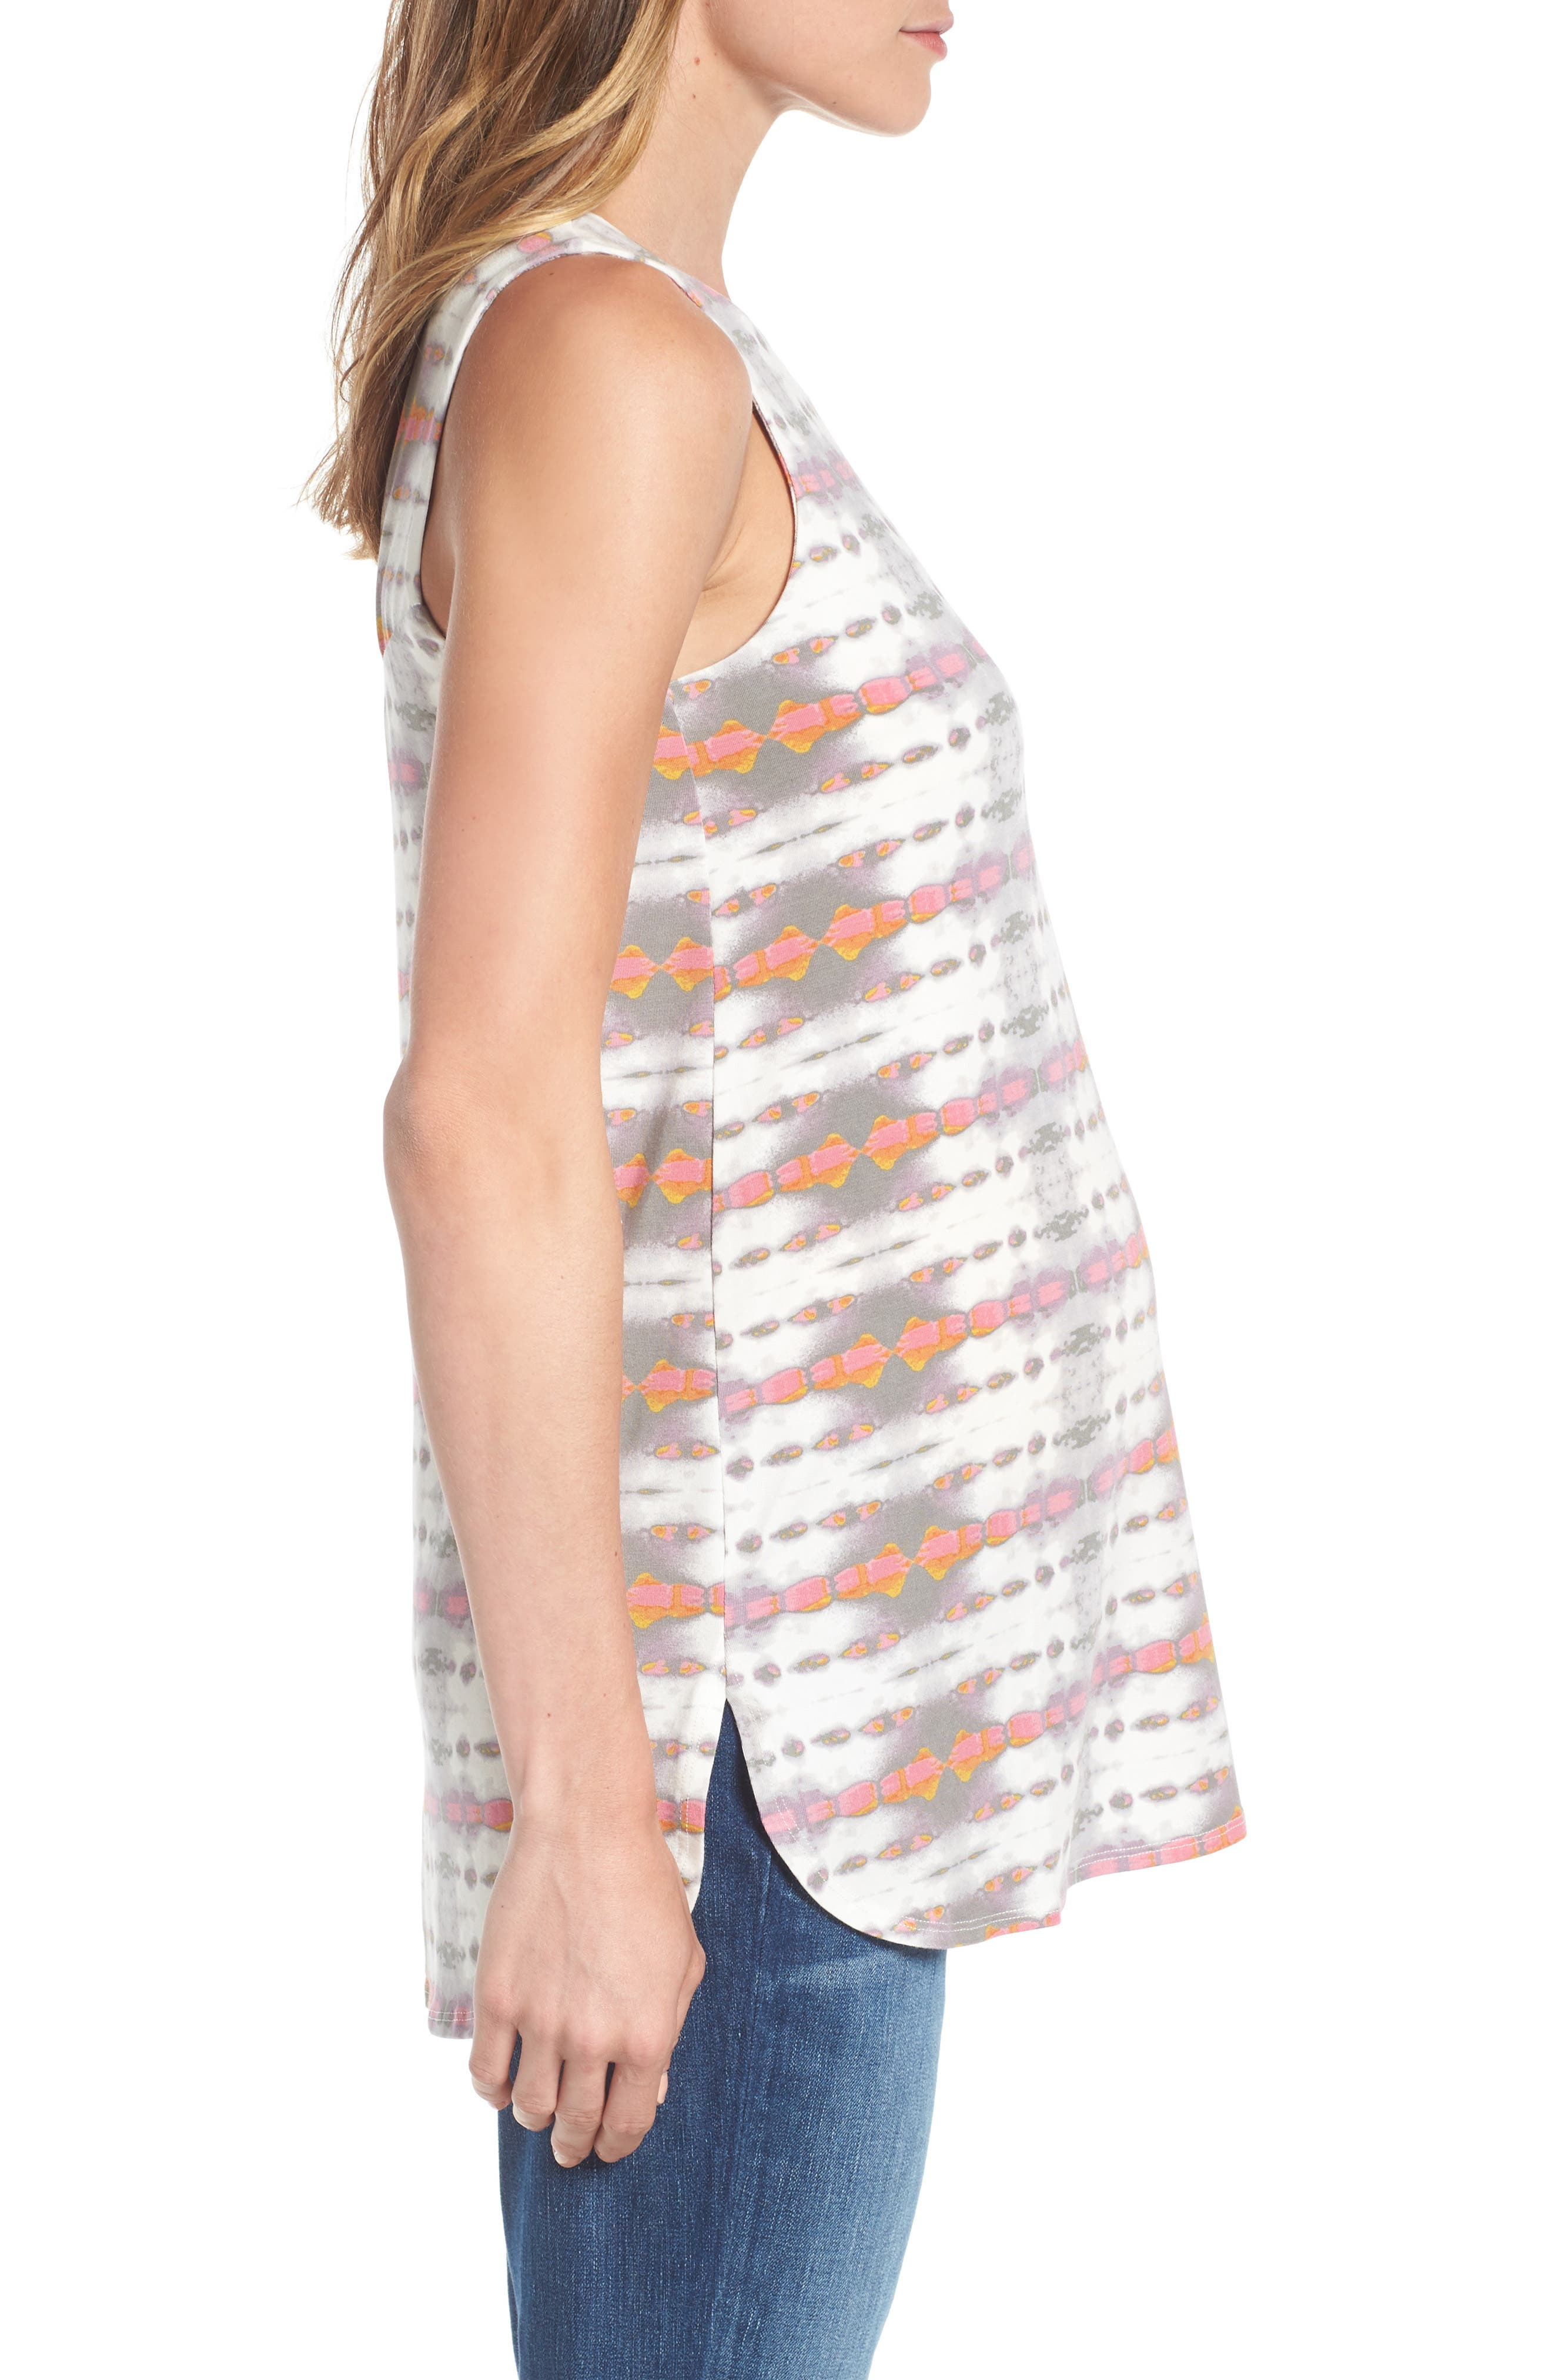 Ursa Maternity Top,                             Alternate thumbnail 3, color,                             Dyed Arrow Stripe